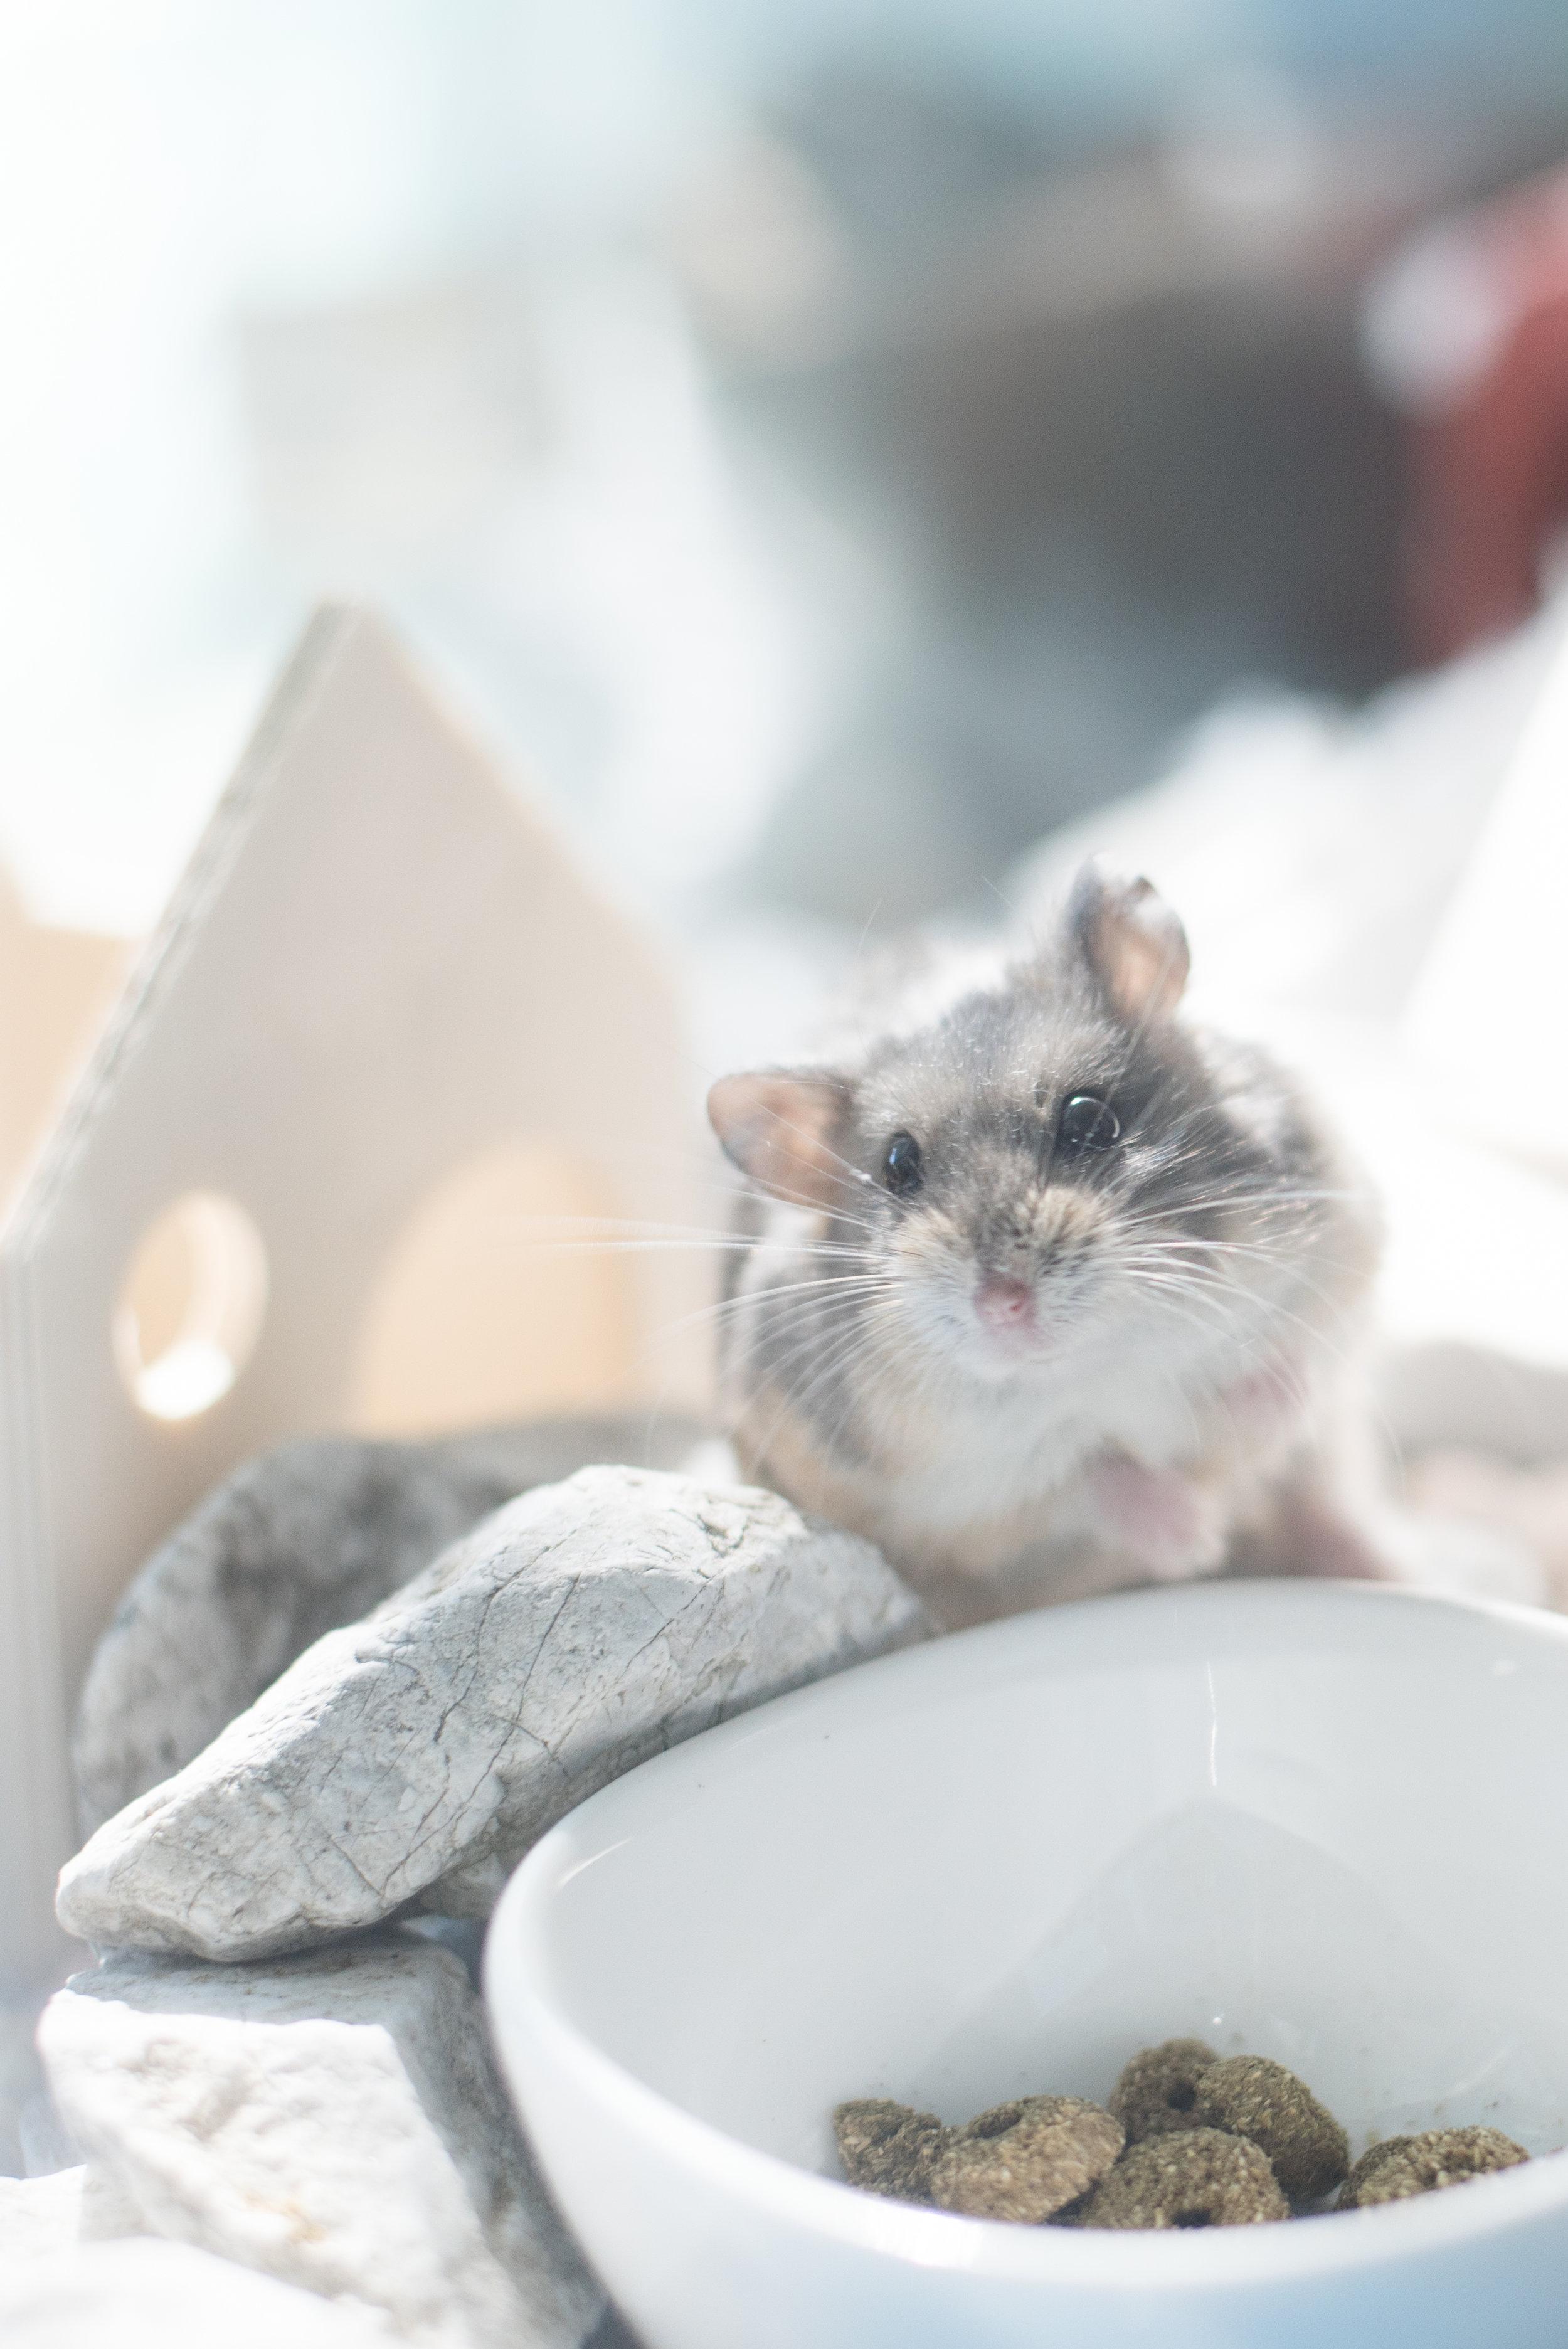 My hamster Mimi 🐹